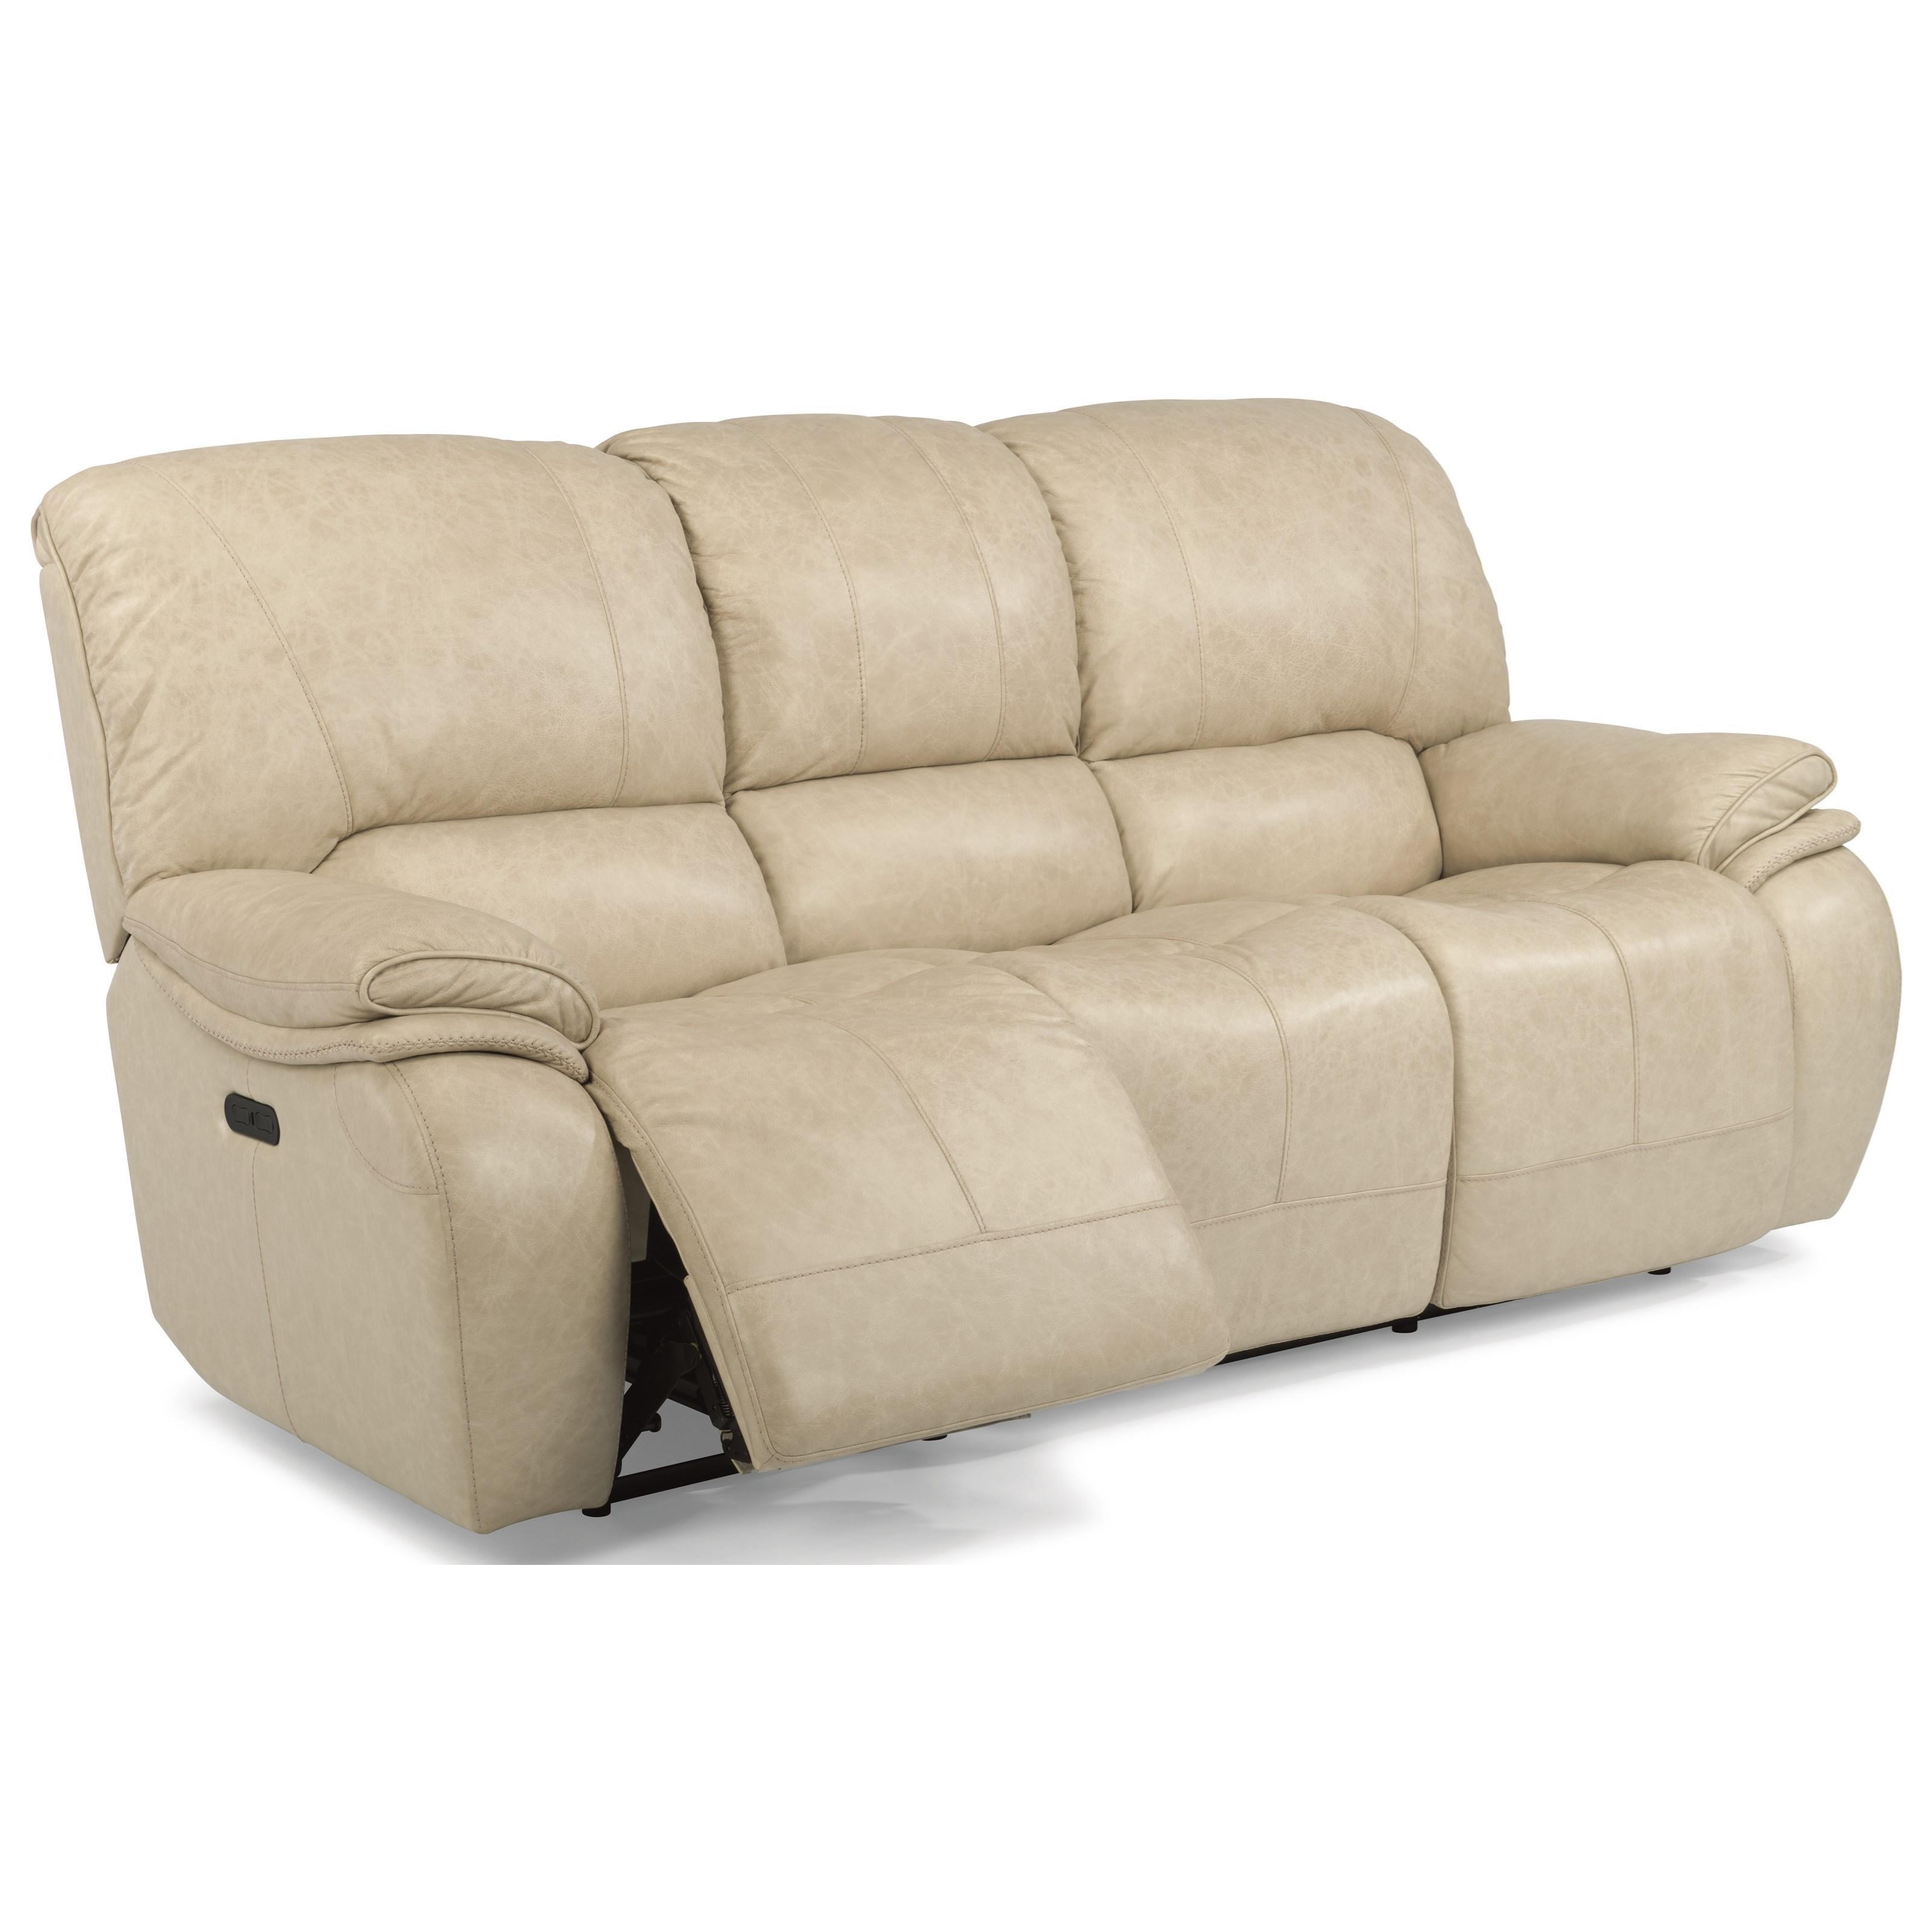 Flexsteel Latitudes-Tobin Power Reclining Sofa with Power Headrest and USB Ports  sc 1 st  Wayside Furniture & Flexsteel Latitudes-Tobin Power Reclining Sofa with Power Headrest ... islam-shia.org